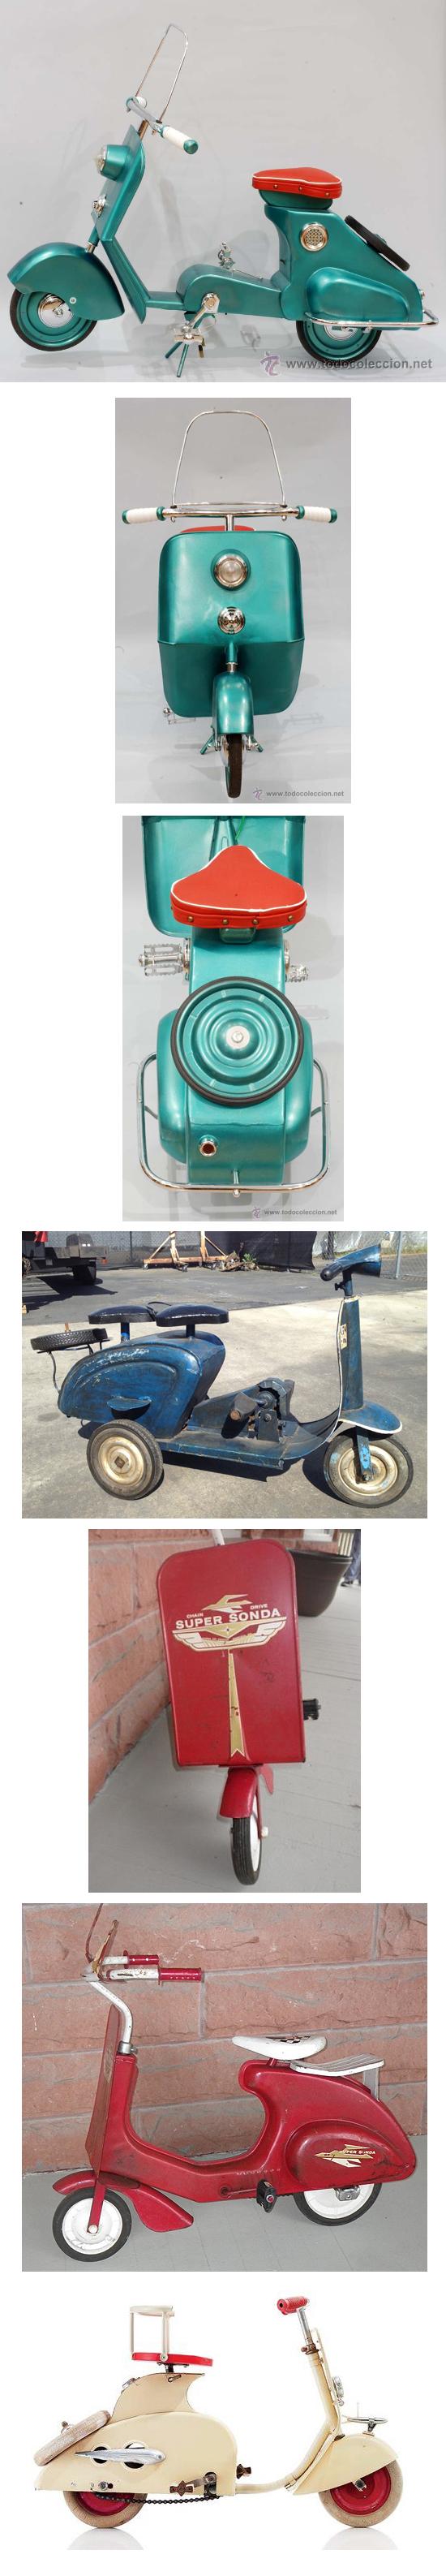 Vintage pedal push scooters vespa lambretta toys